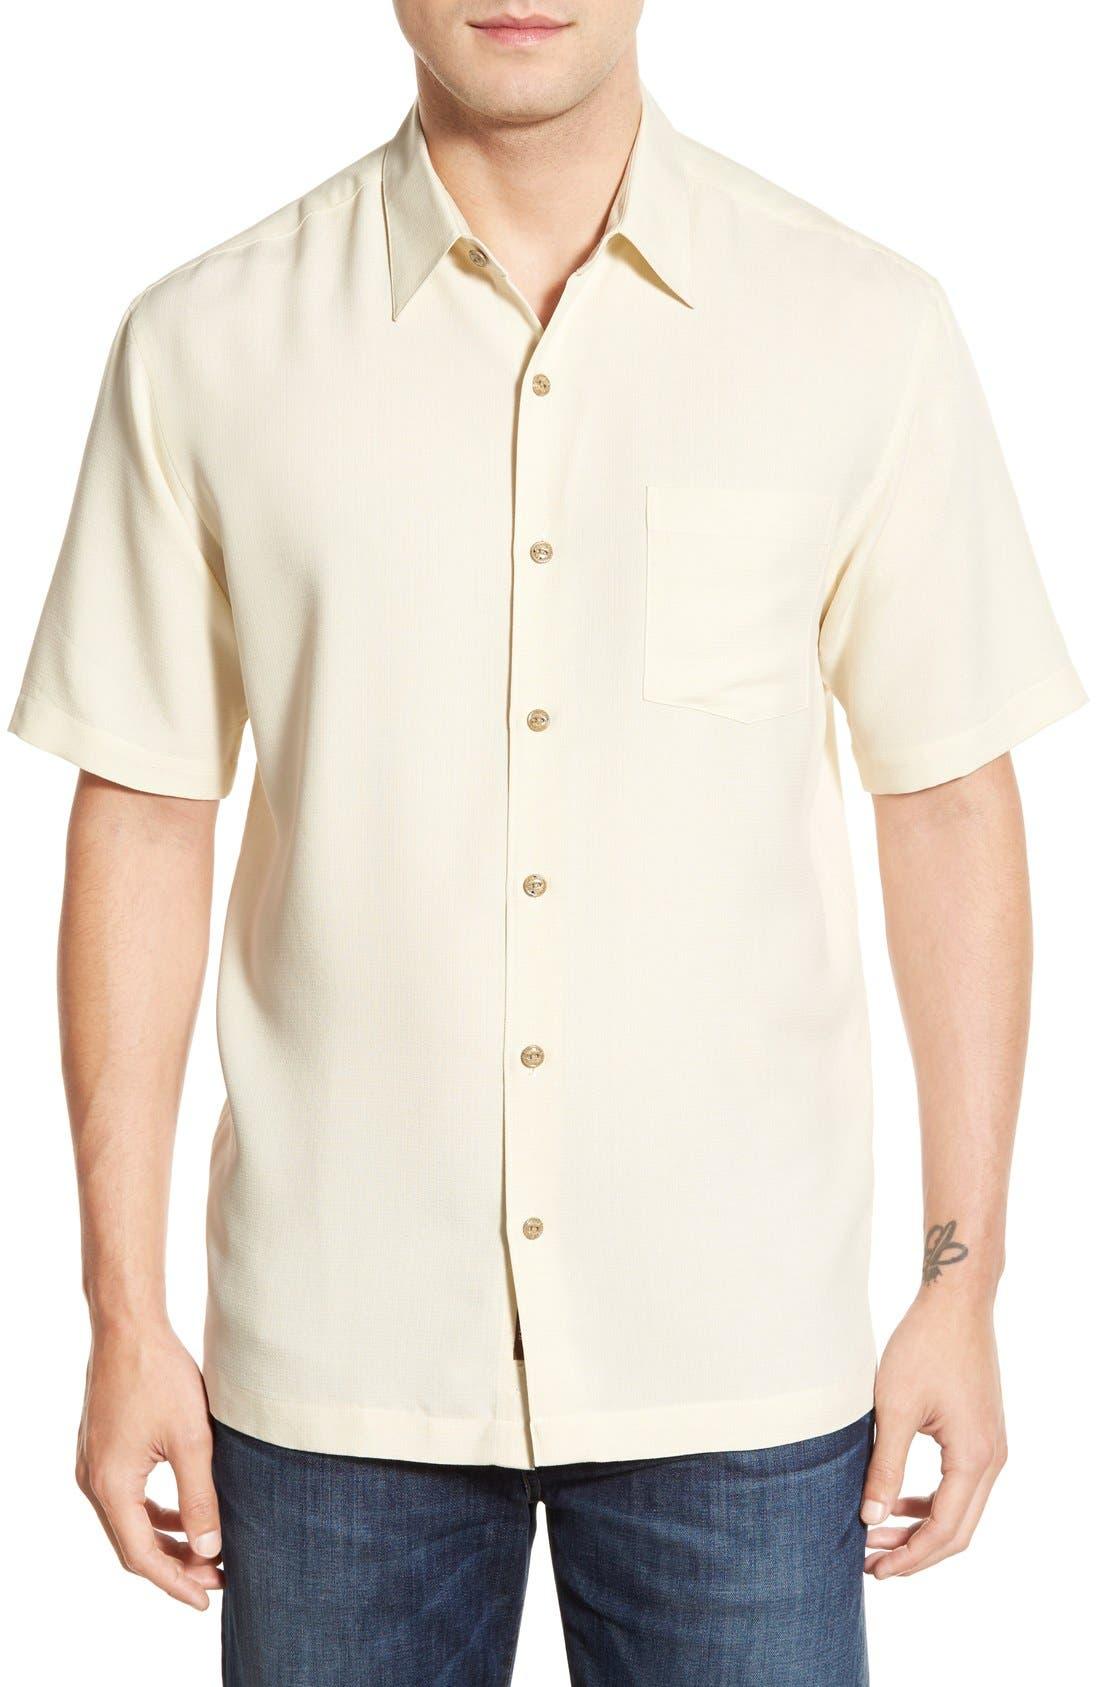 Alternate Image 1 Selected - Kahala 'Wind N Sea' Regular Fit Sport Shirt